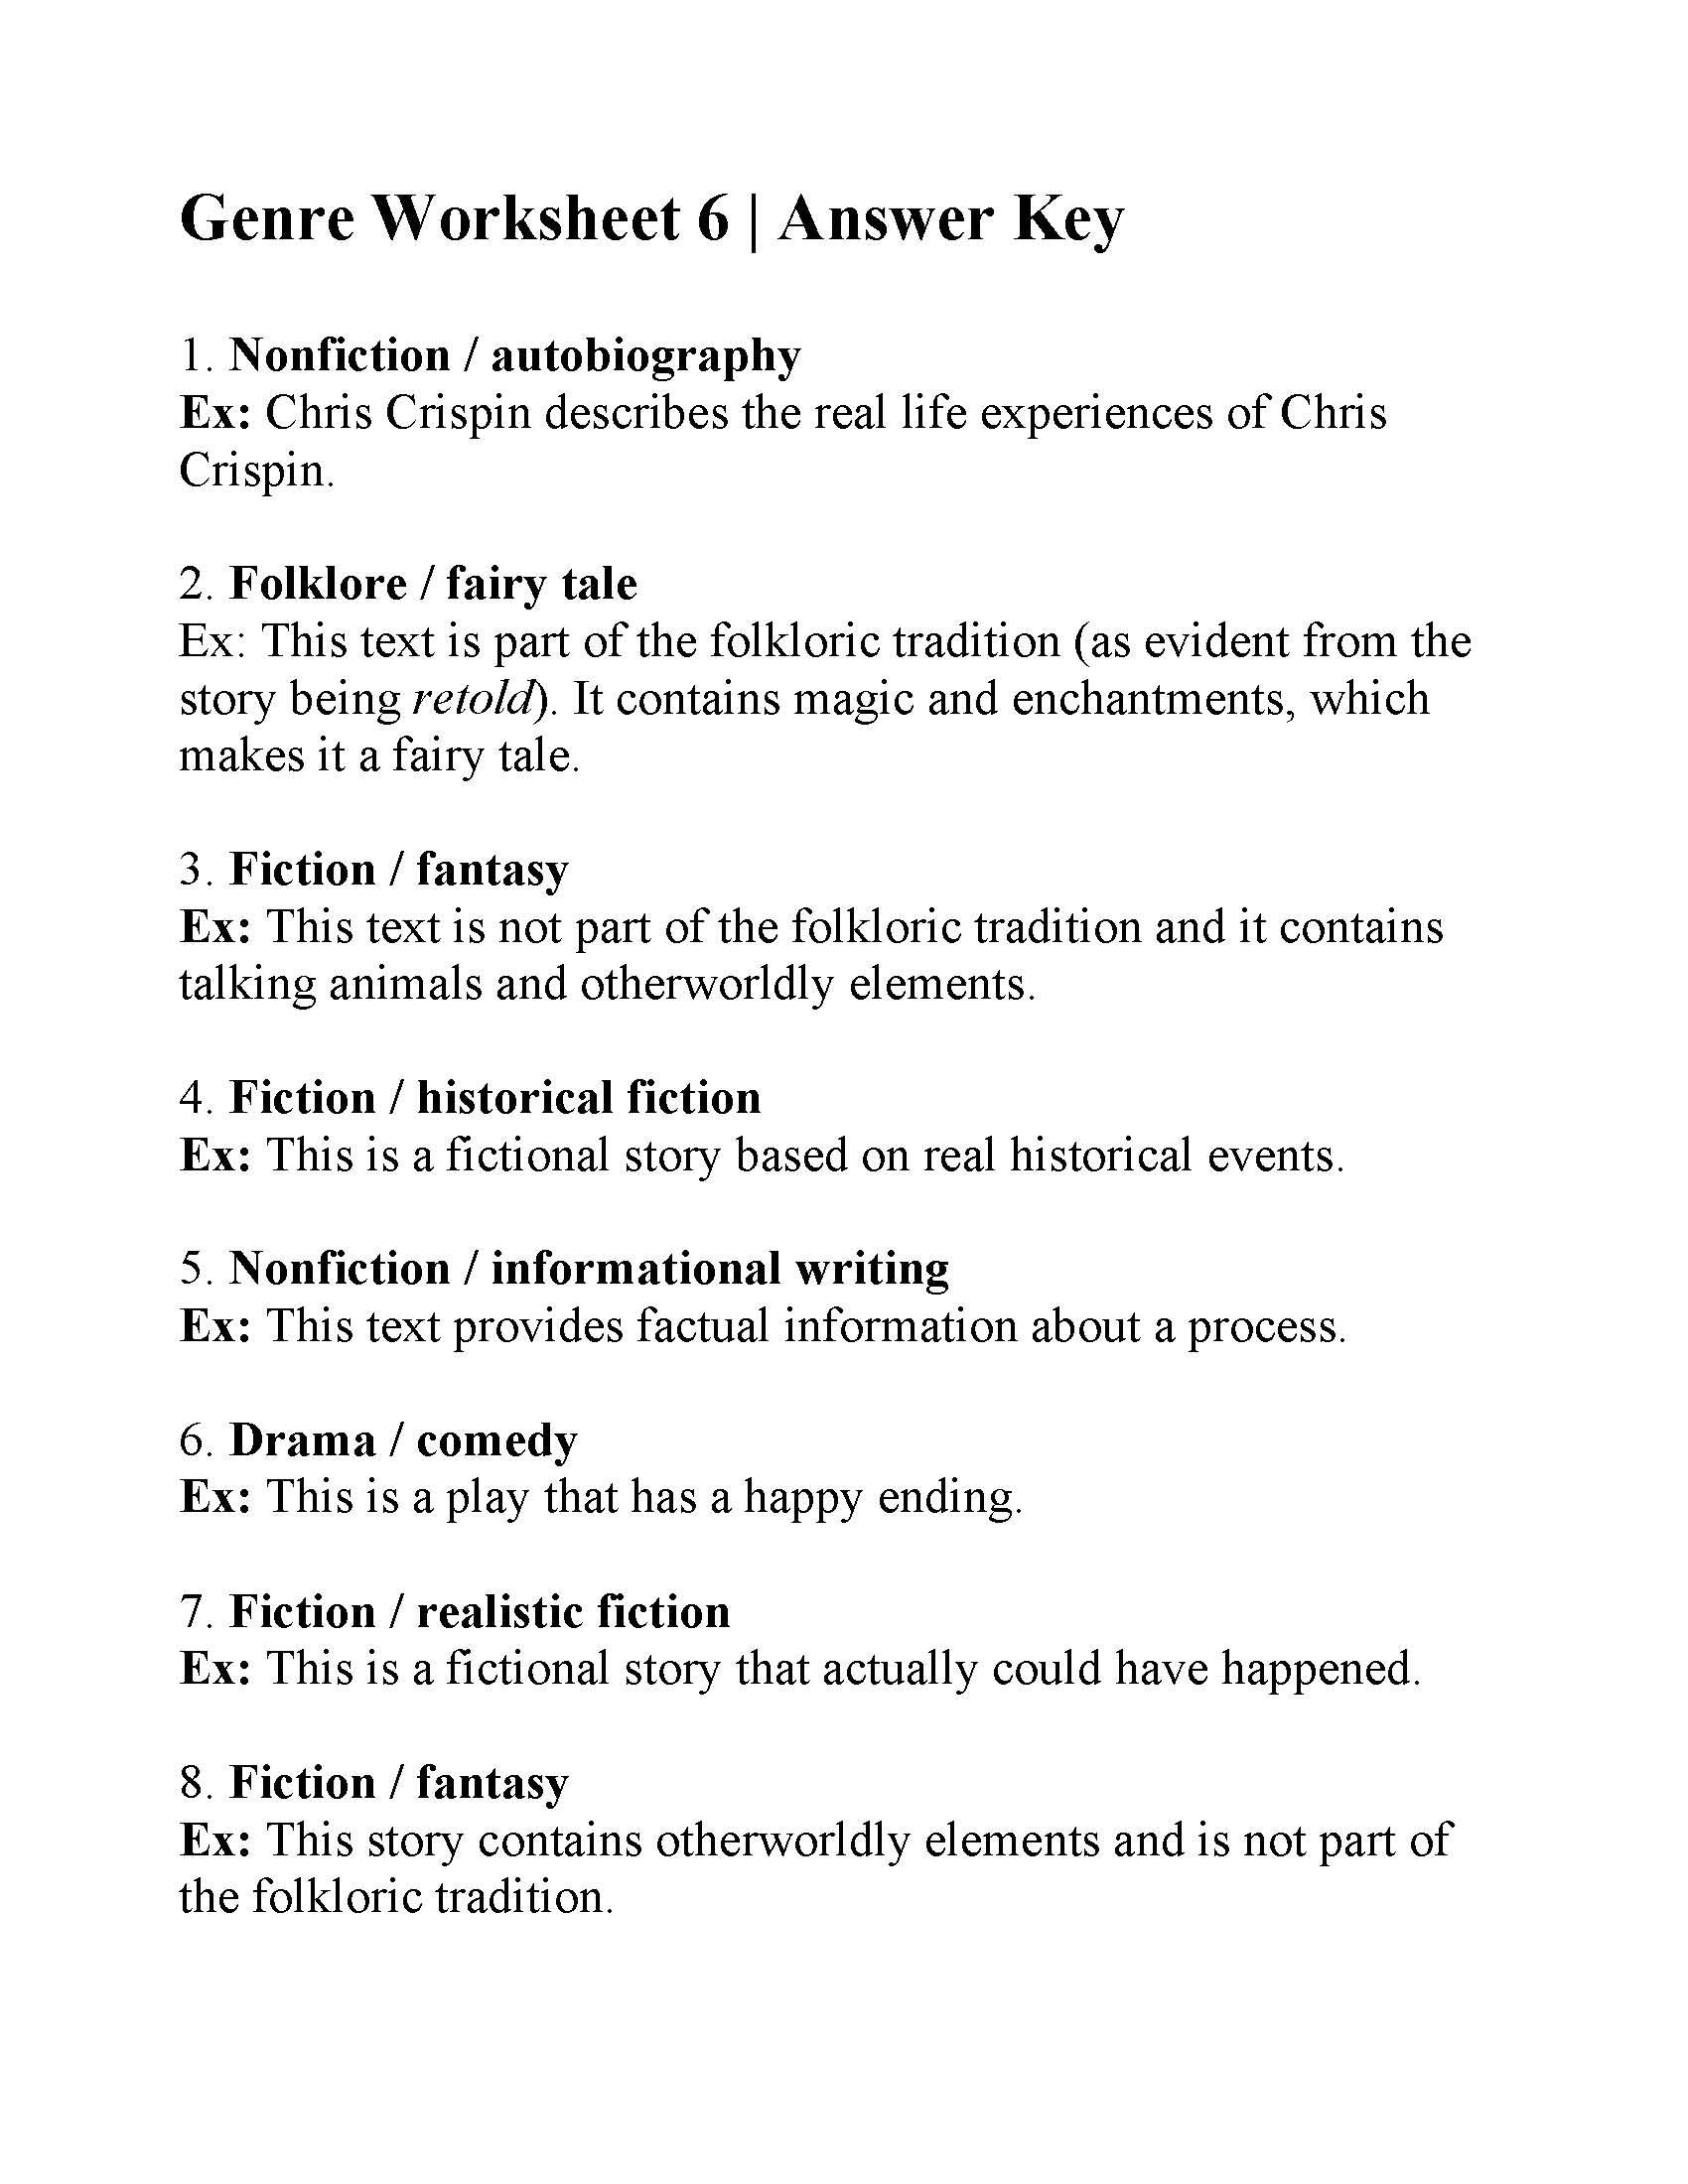 Genre Worksheet 6 | Answers